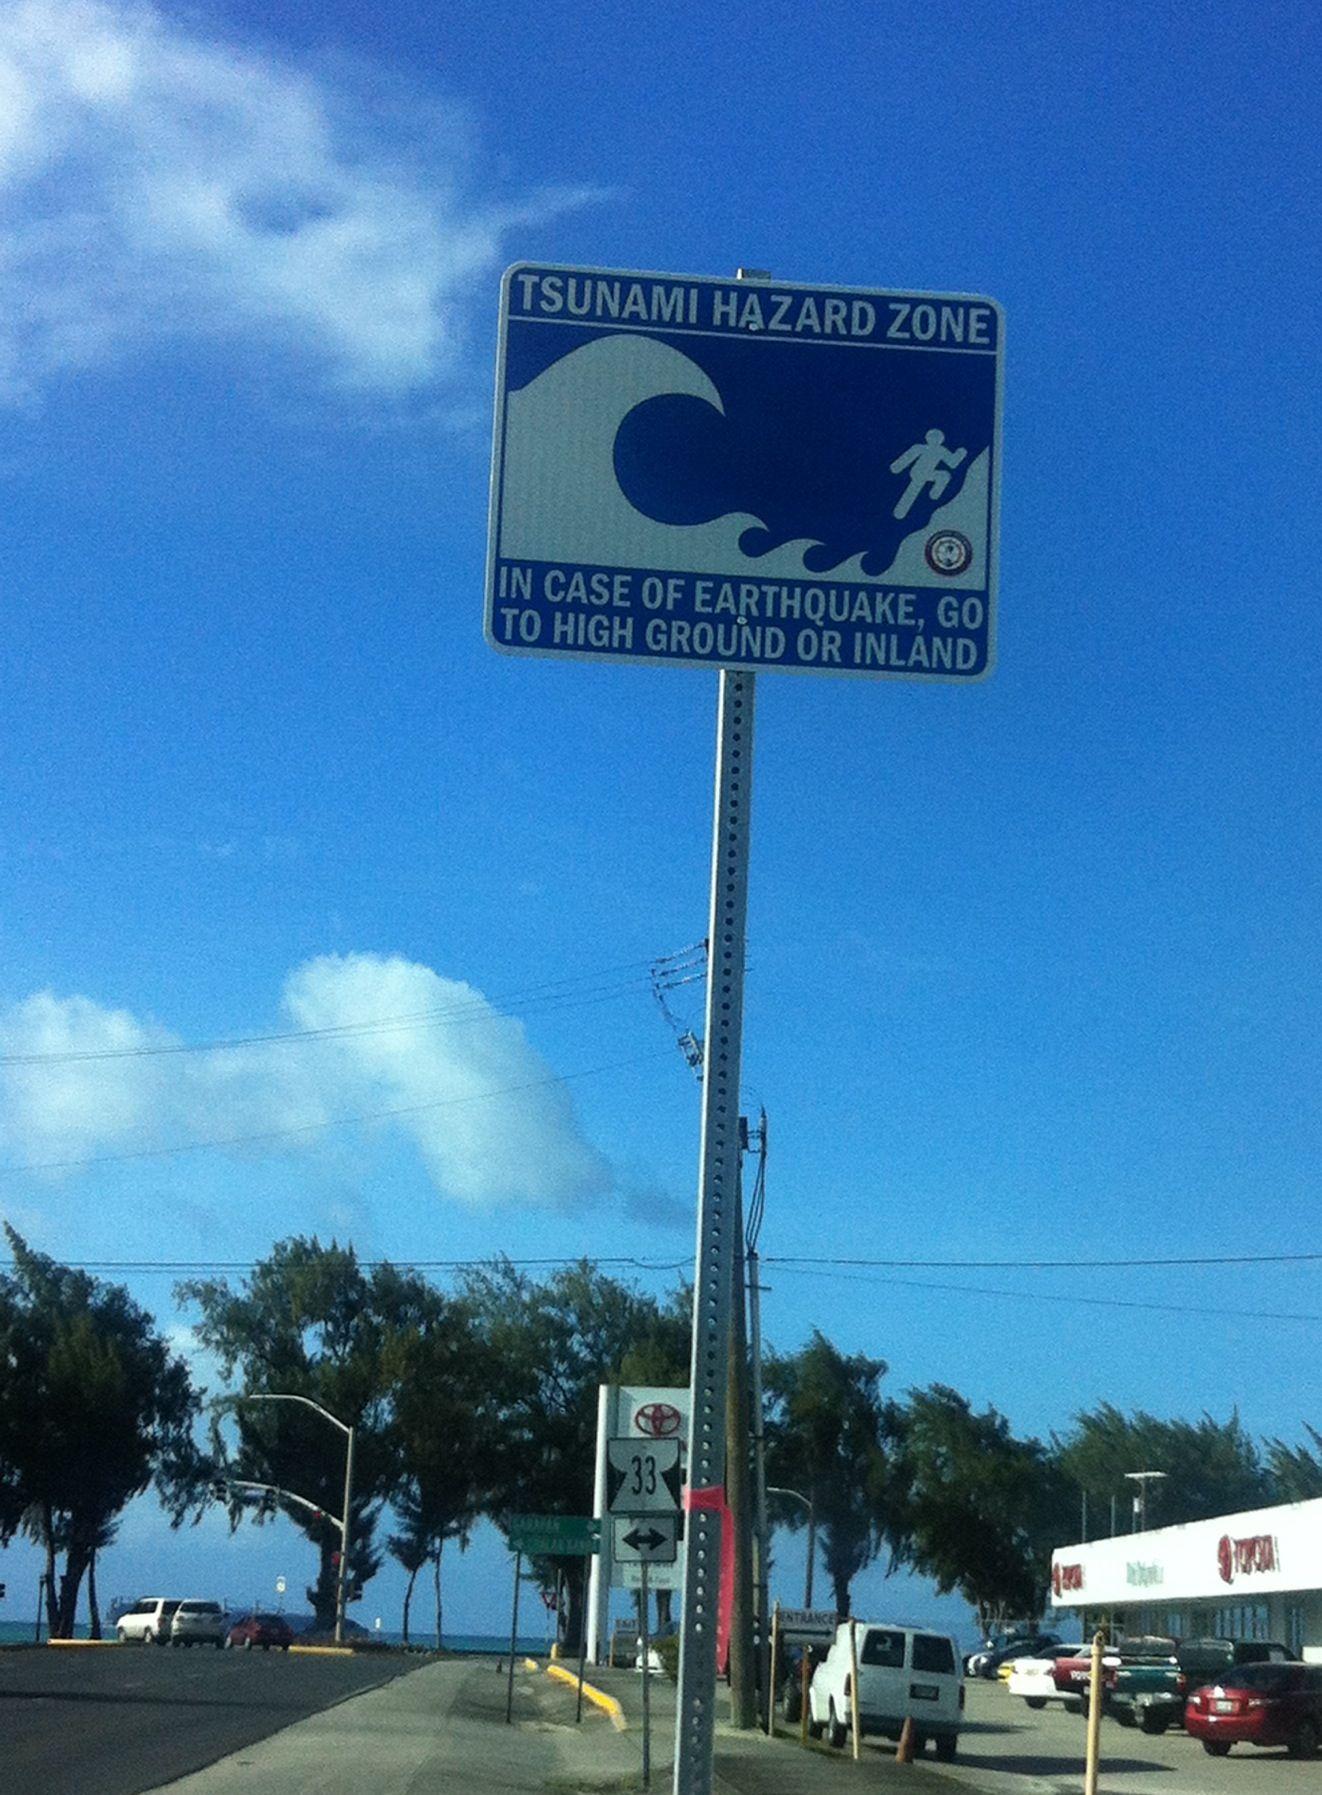 tsunami hazard sign along beachroad intersection island